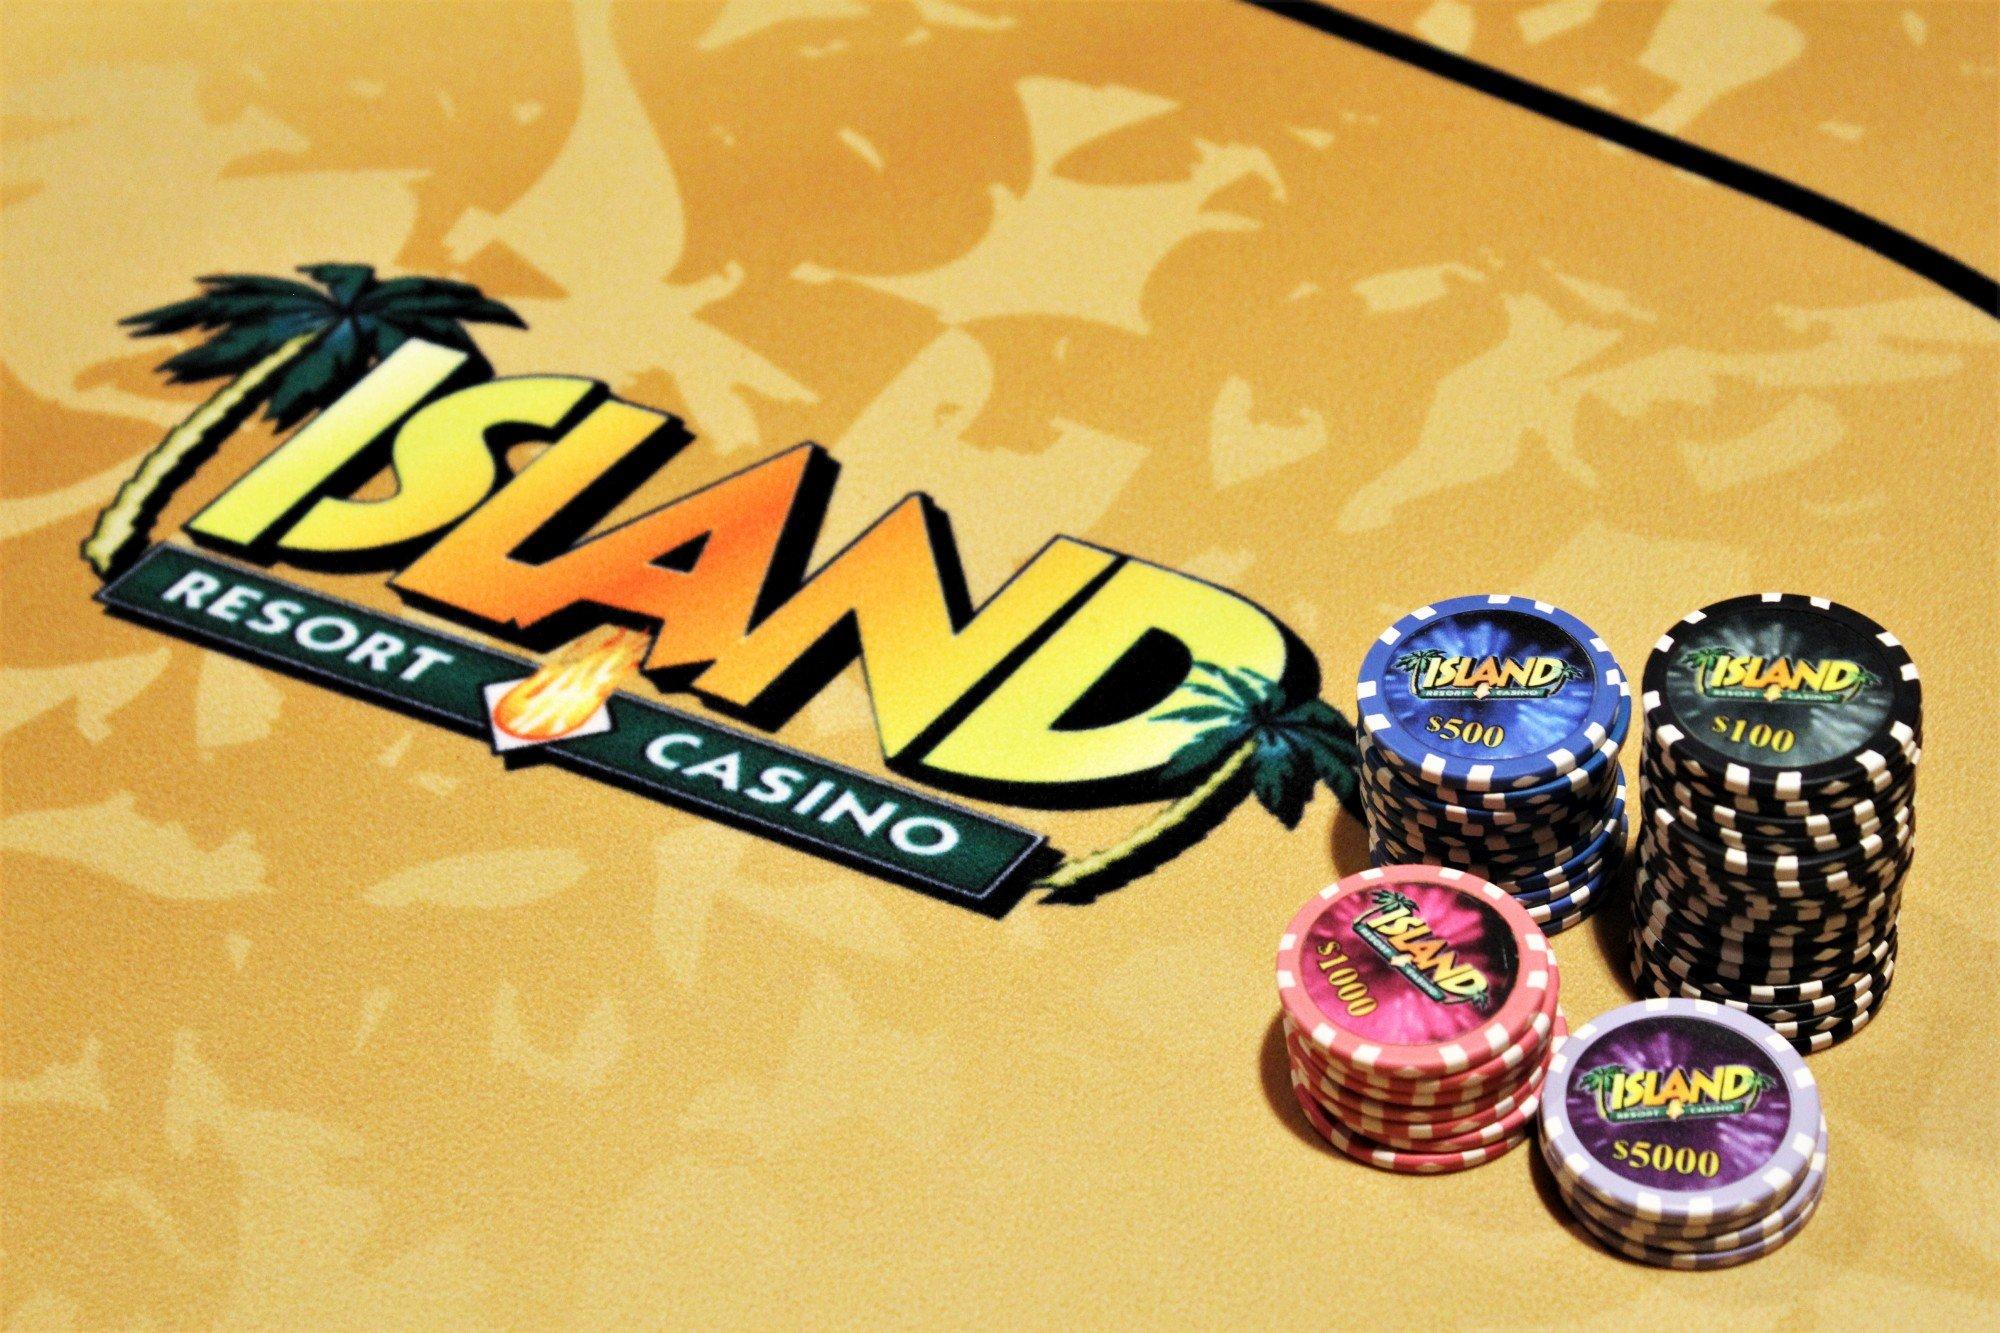 Island Poker Tournament Table